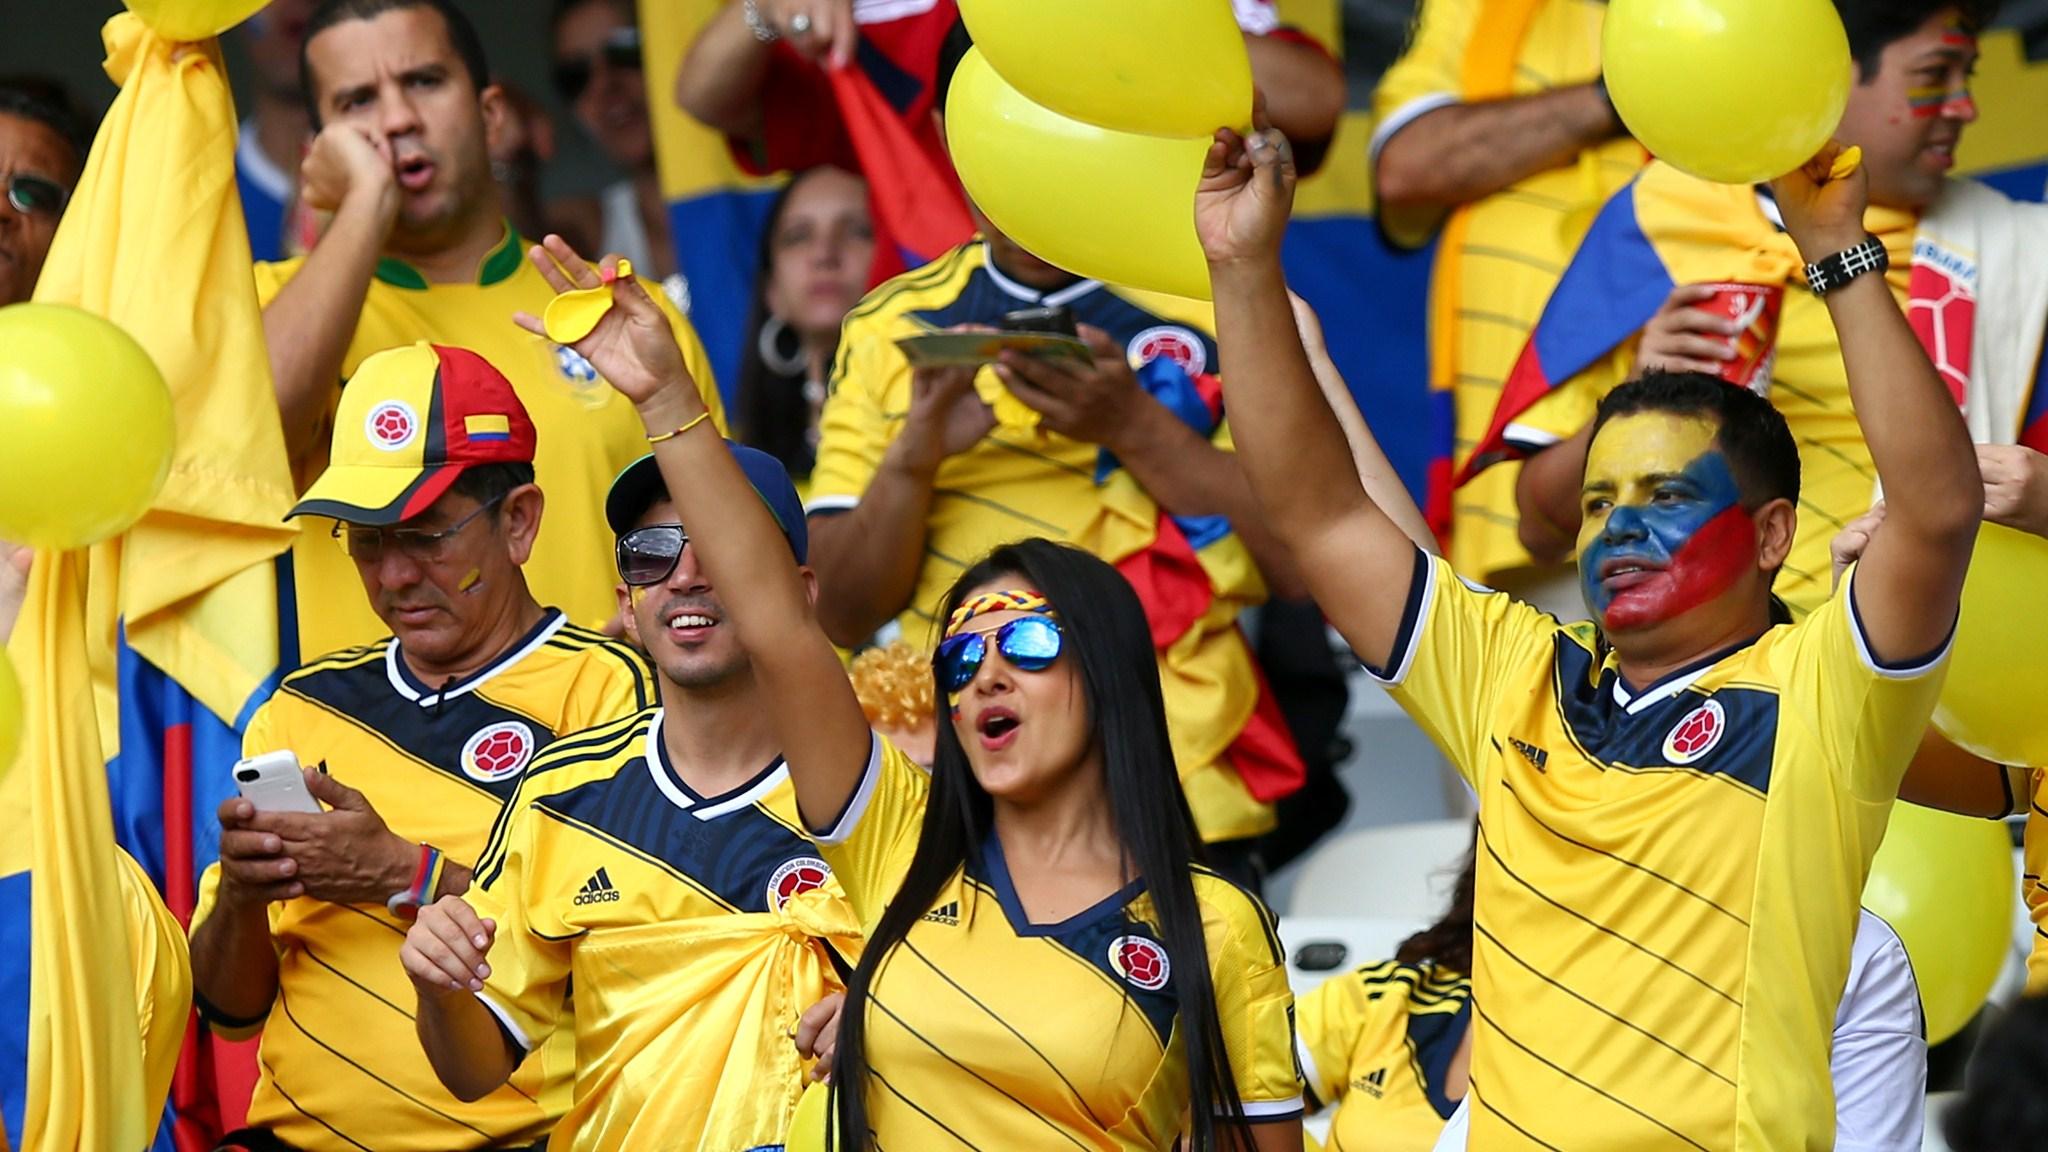 77 - Colombia-Greece [3-0] -- 14 Jun 2014 - 13-00 -- Belo Horizonte - Estadio Mineirao - kuaza